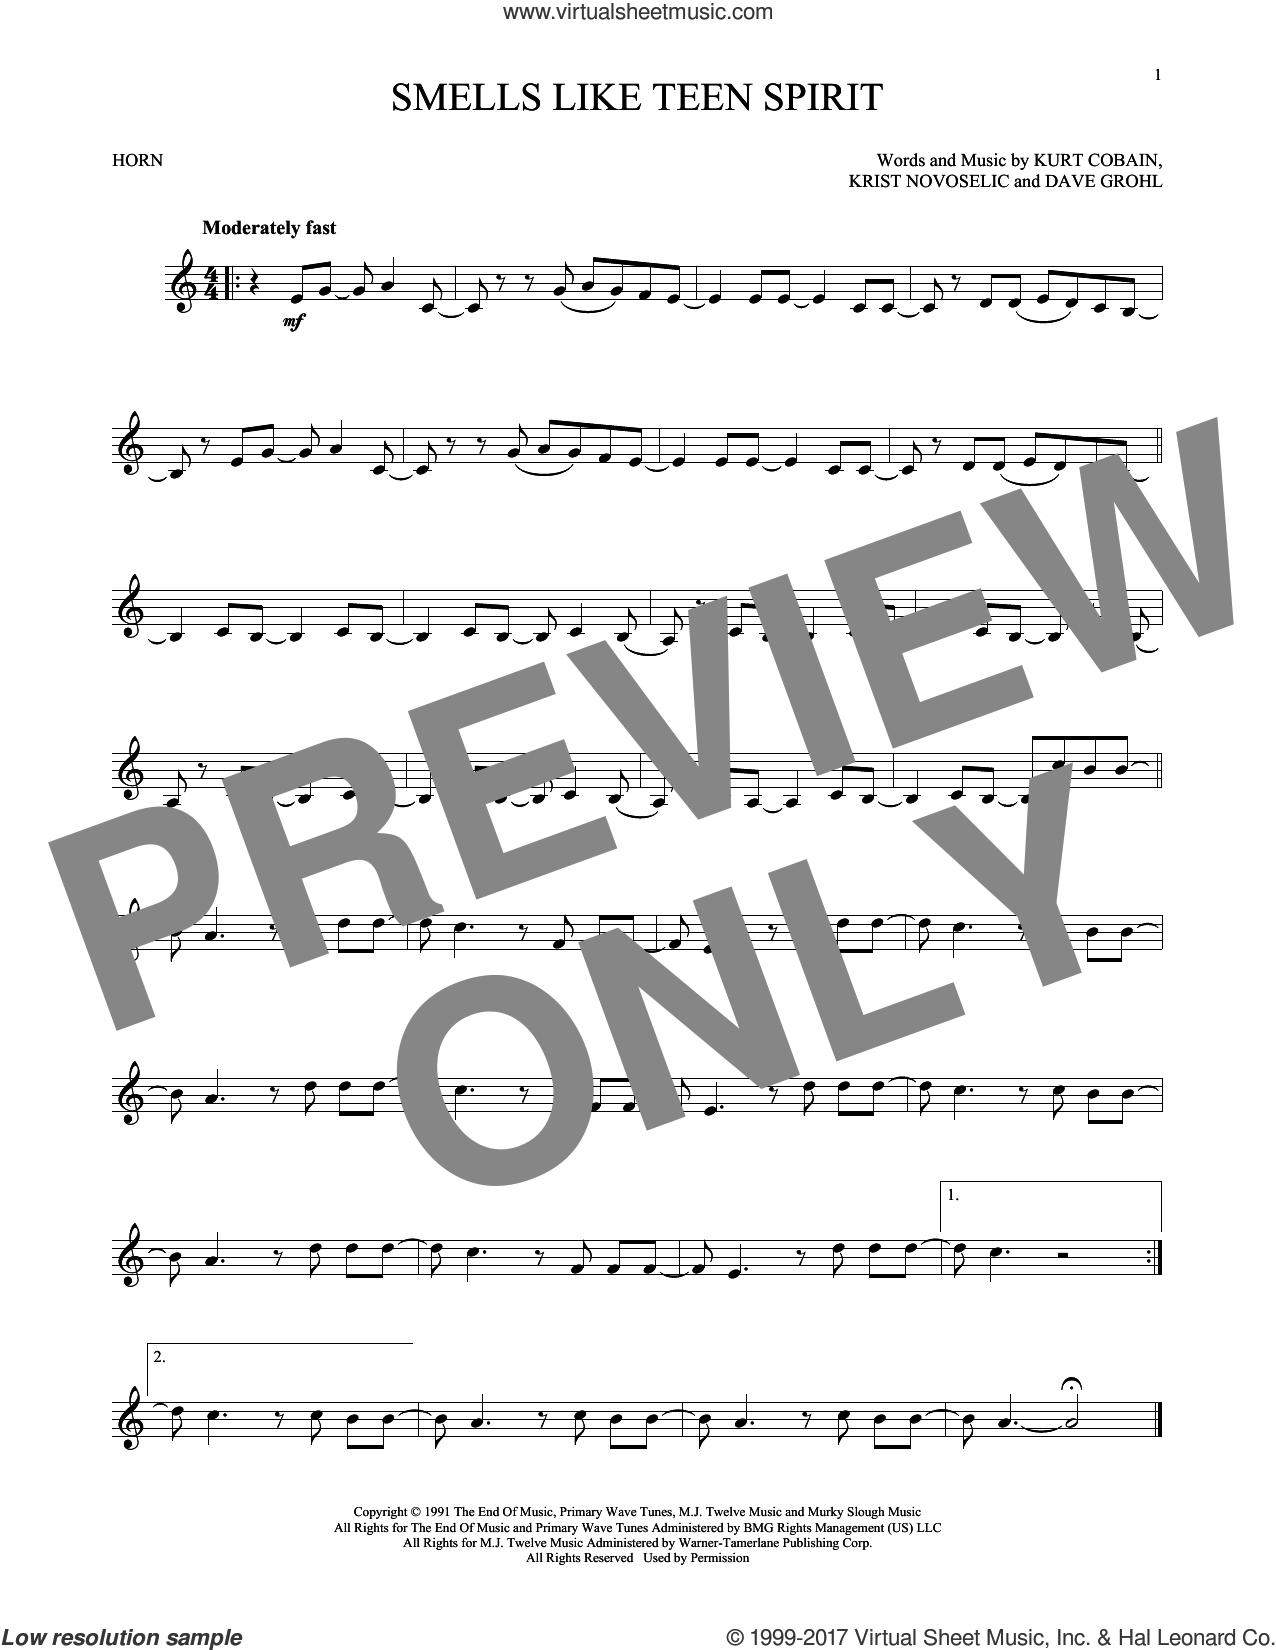 Smells Like Teen Spirit sheet music for horn solo by Nirvana, Dave Grohl, Krist Novoselic and Kurt Cobain, intermediate skill level